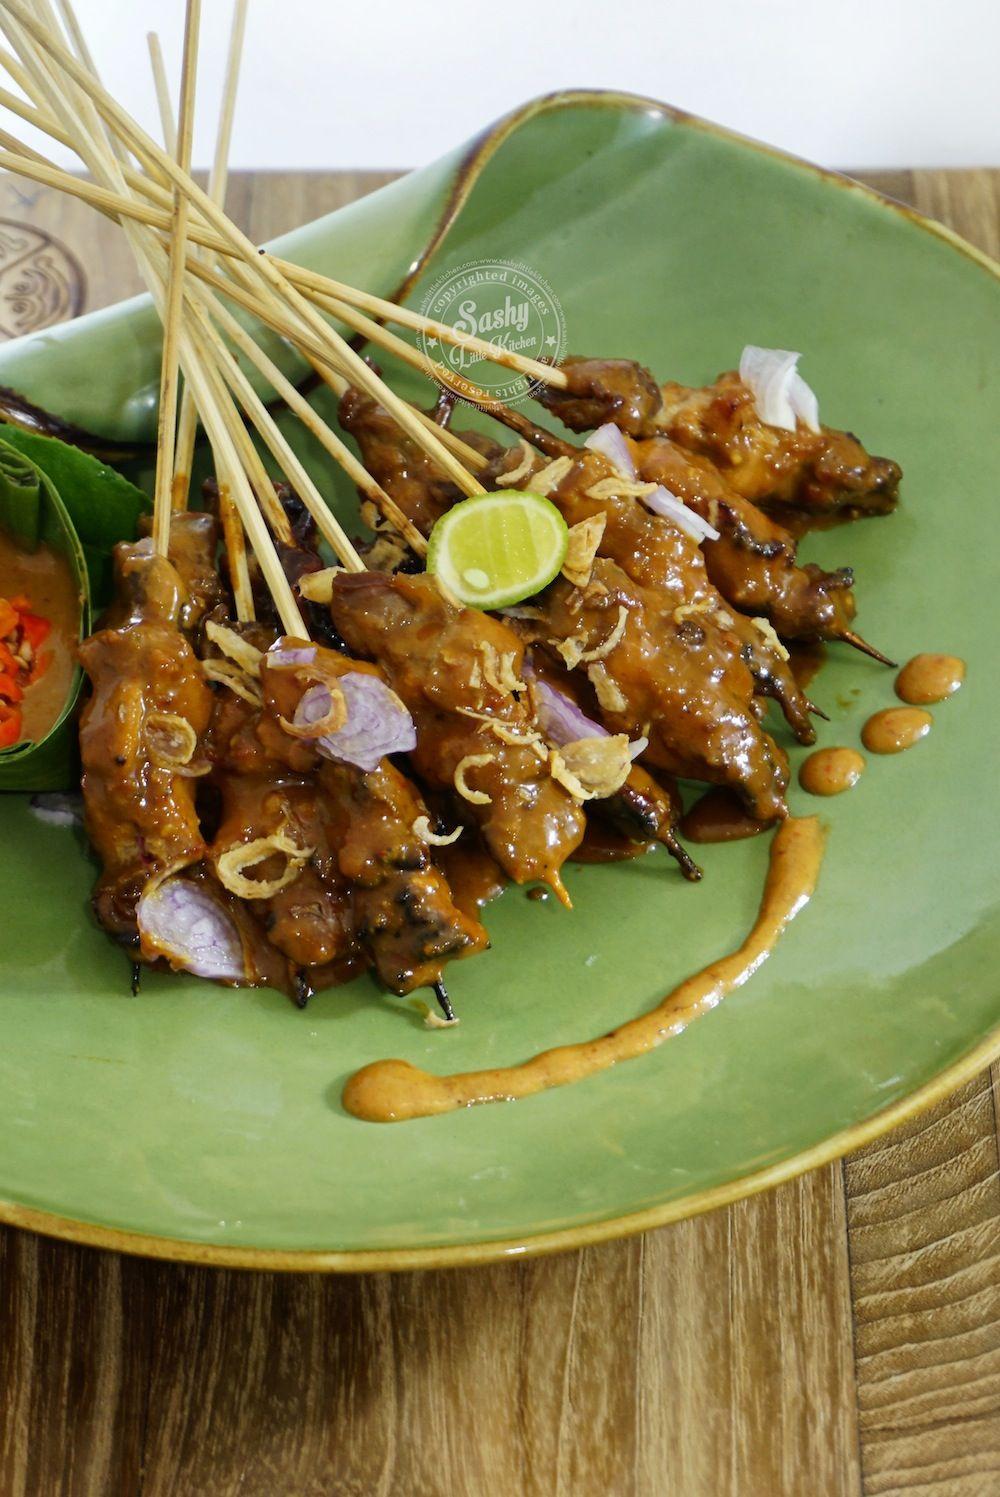 Sate Ayam Madura Fotografi Makanan Resep Masakan Resep Masakan Indonesia